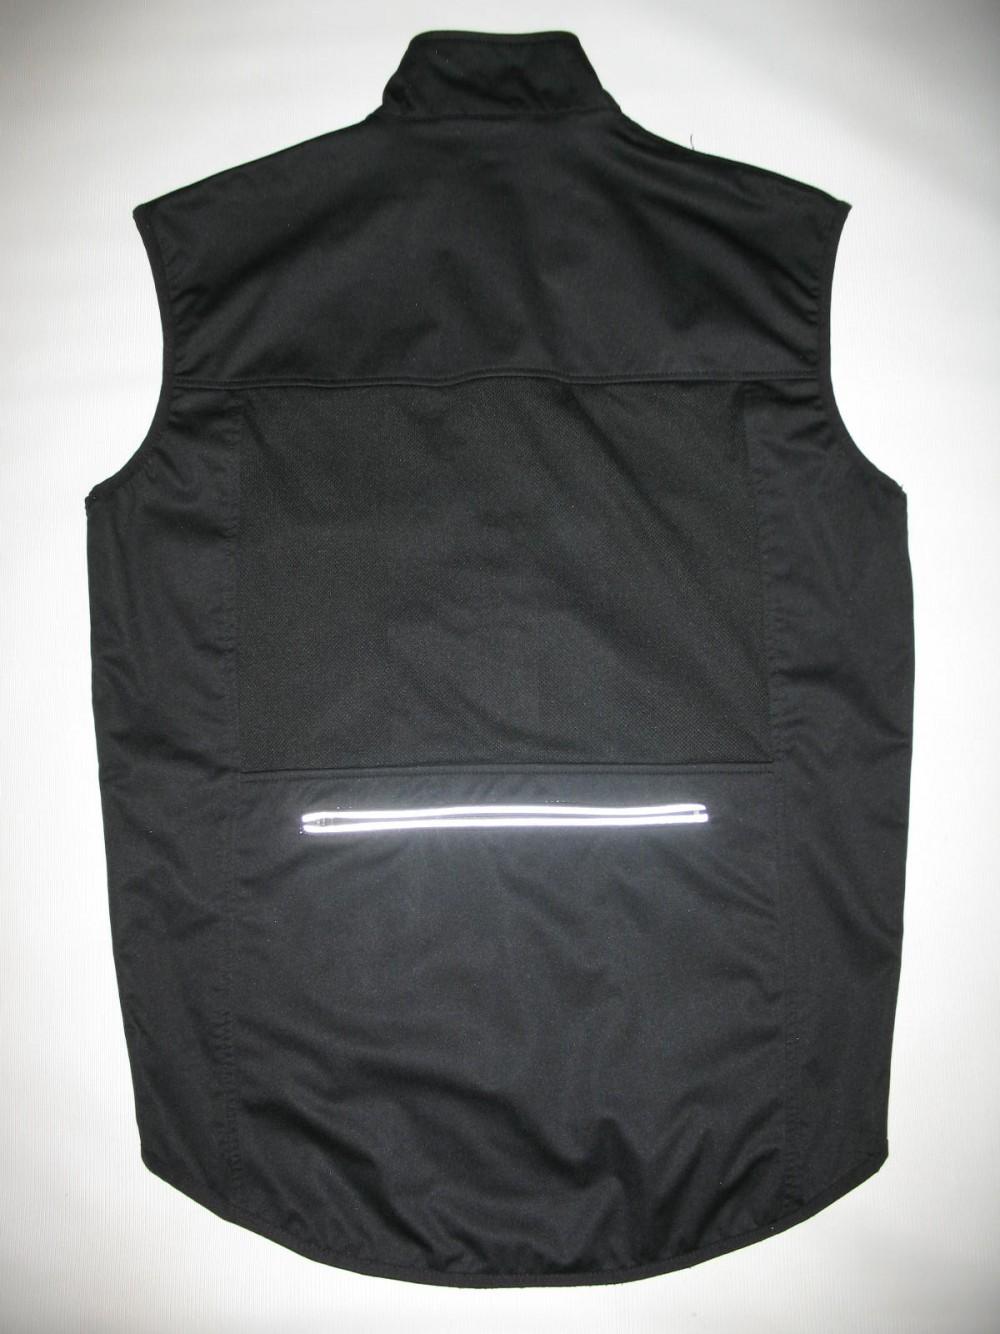 Жилет NKD windstopper vest (размер M) - 1